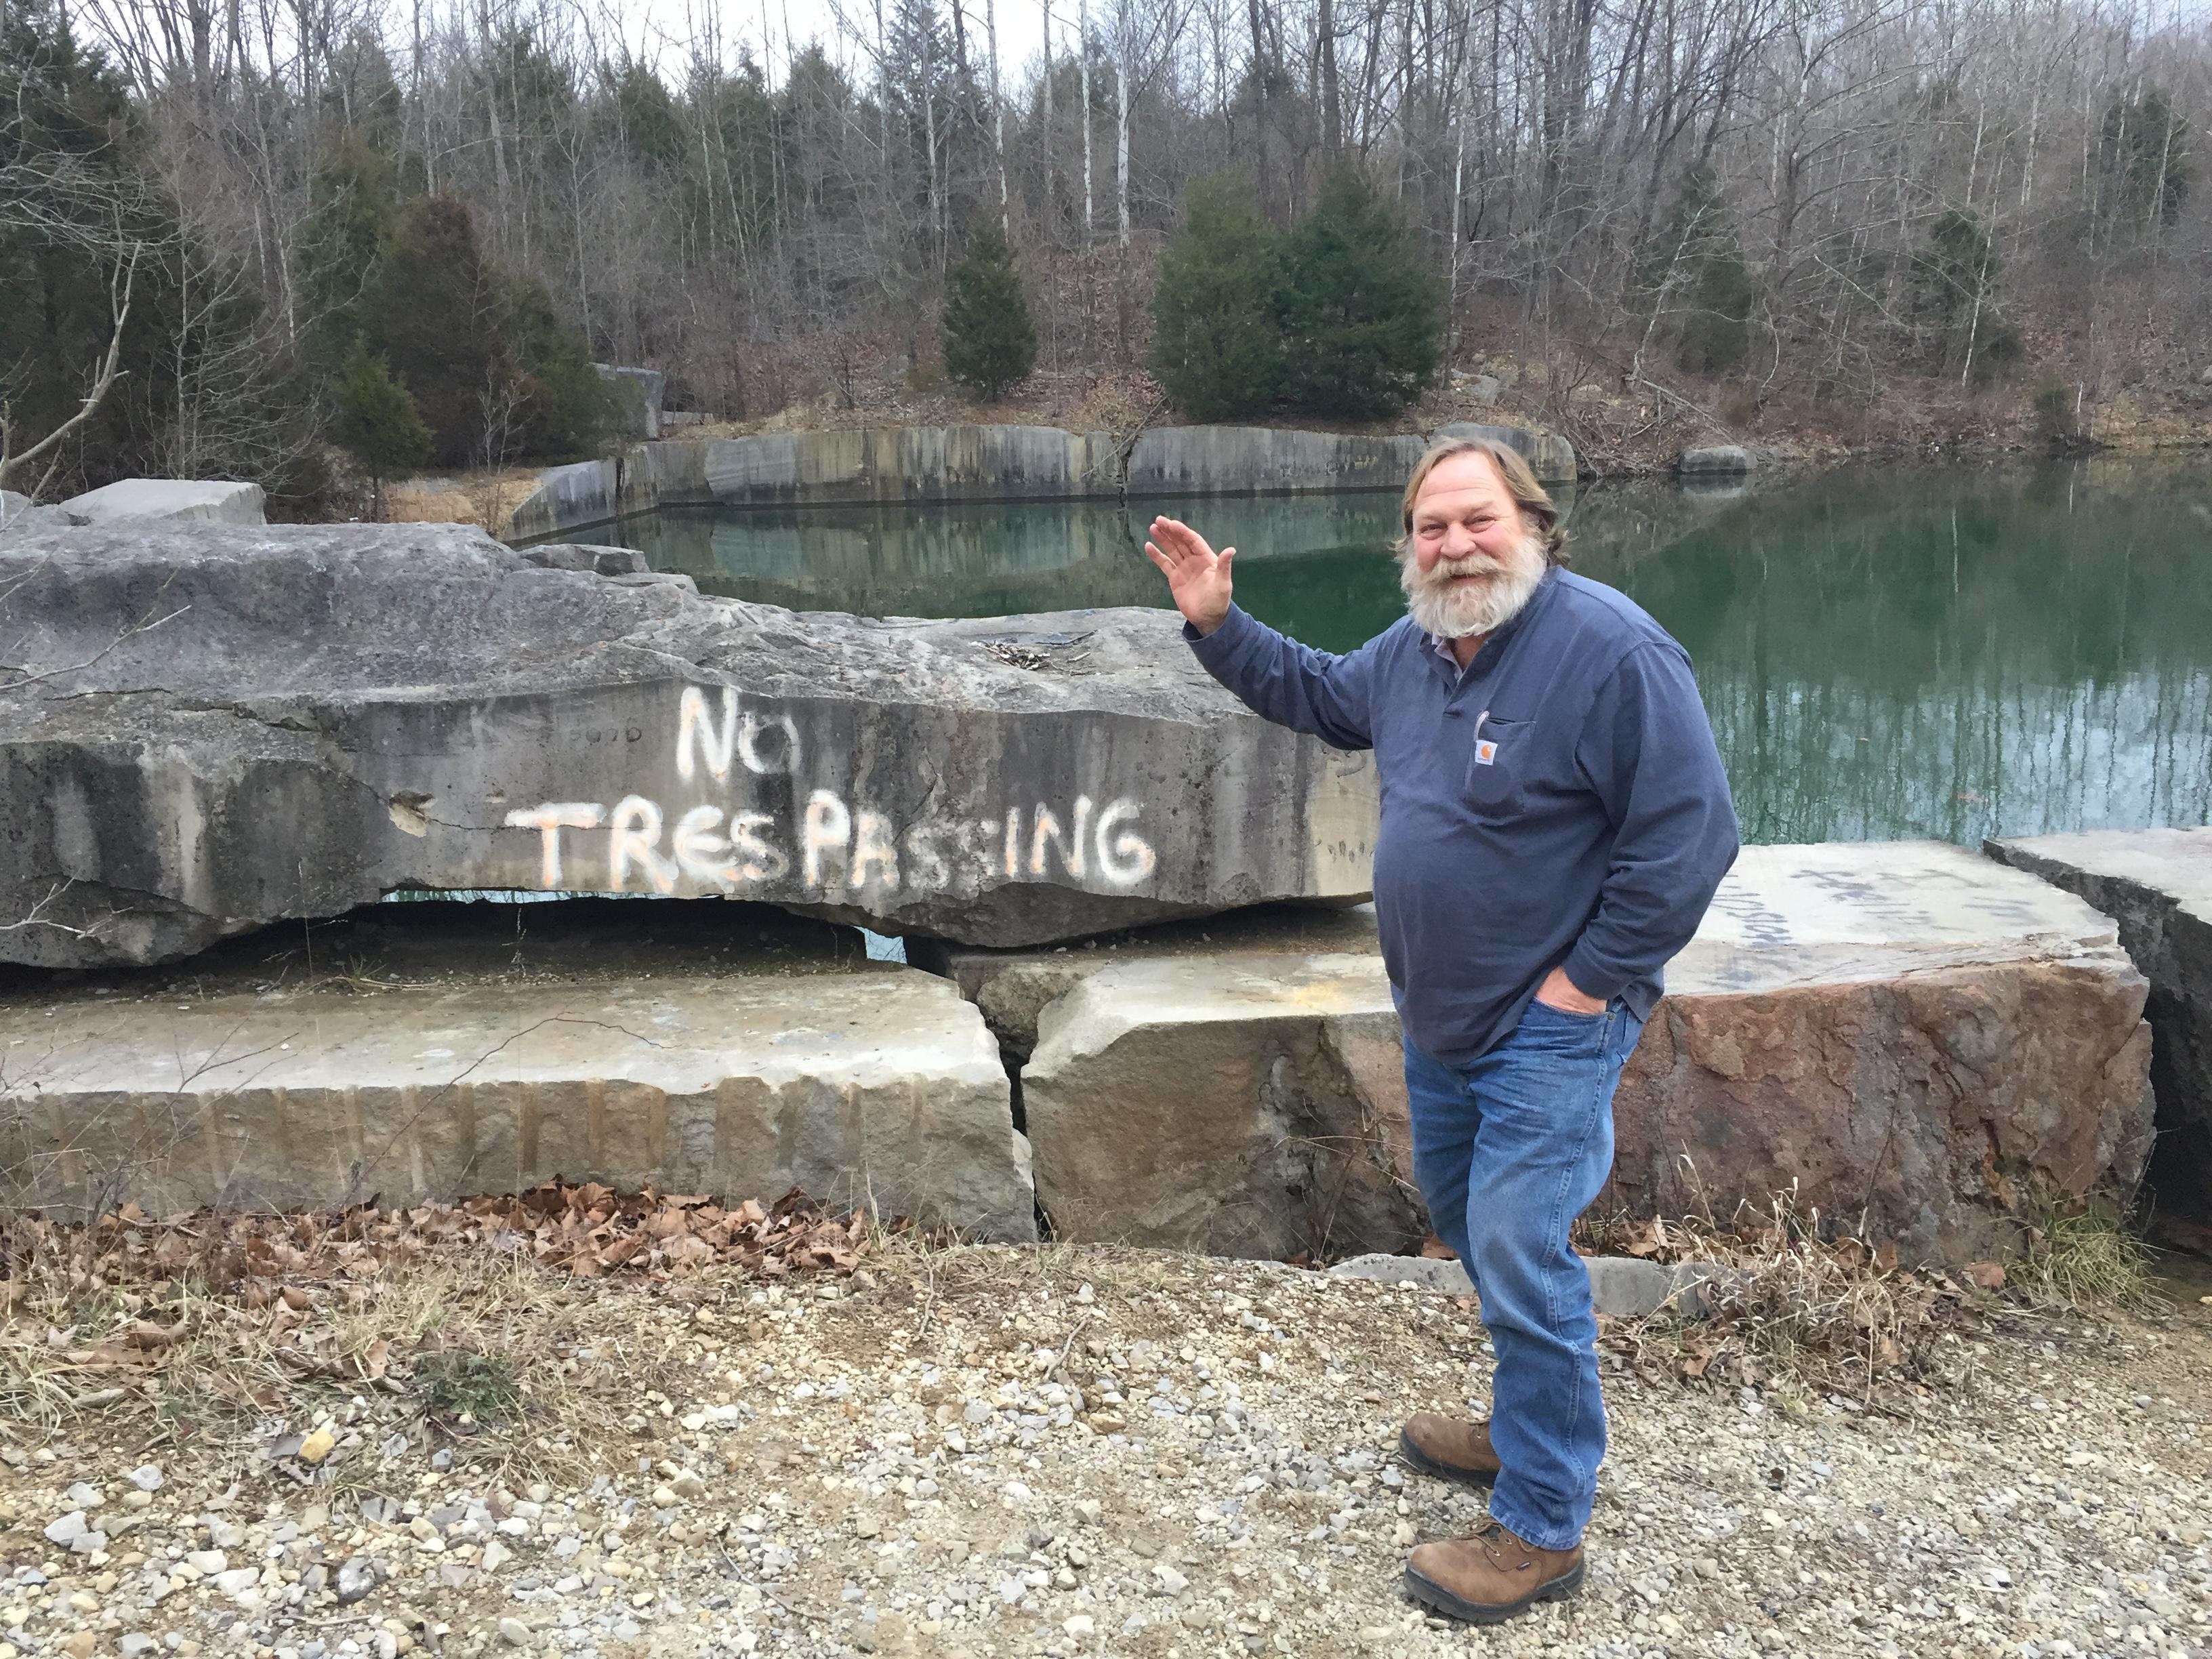 John trespassing